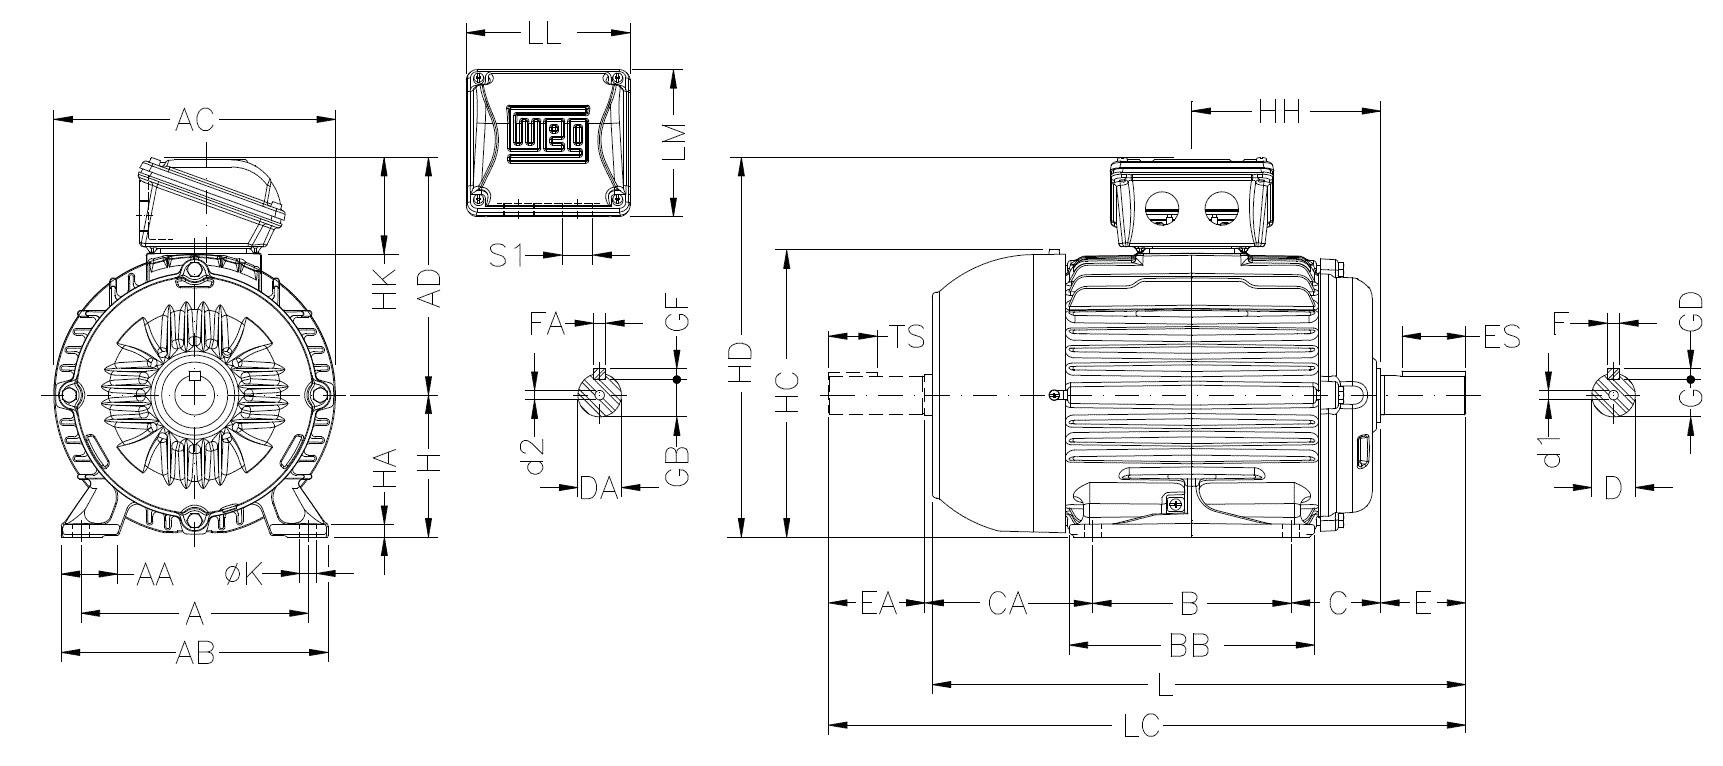 Weg - Free CAD models - W22 General Purpose - TraceParts